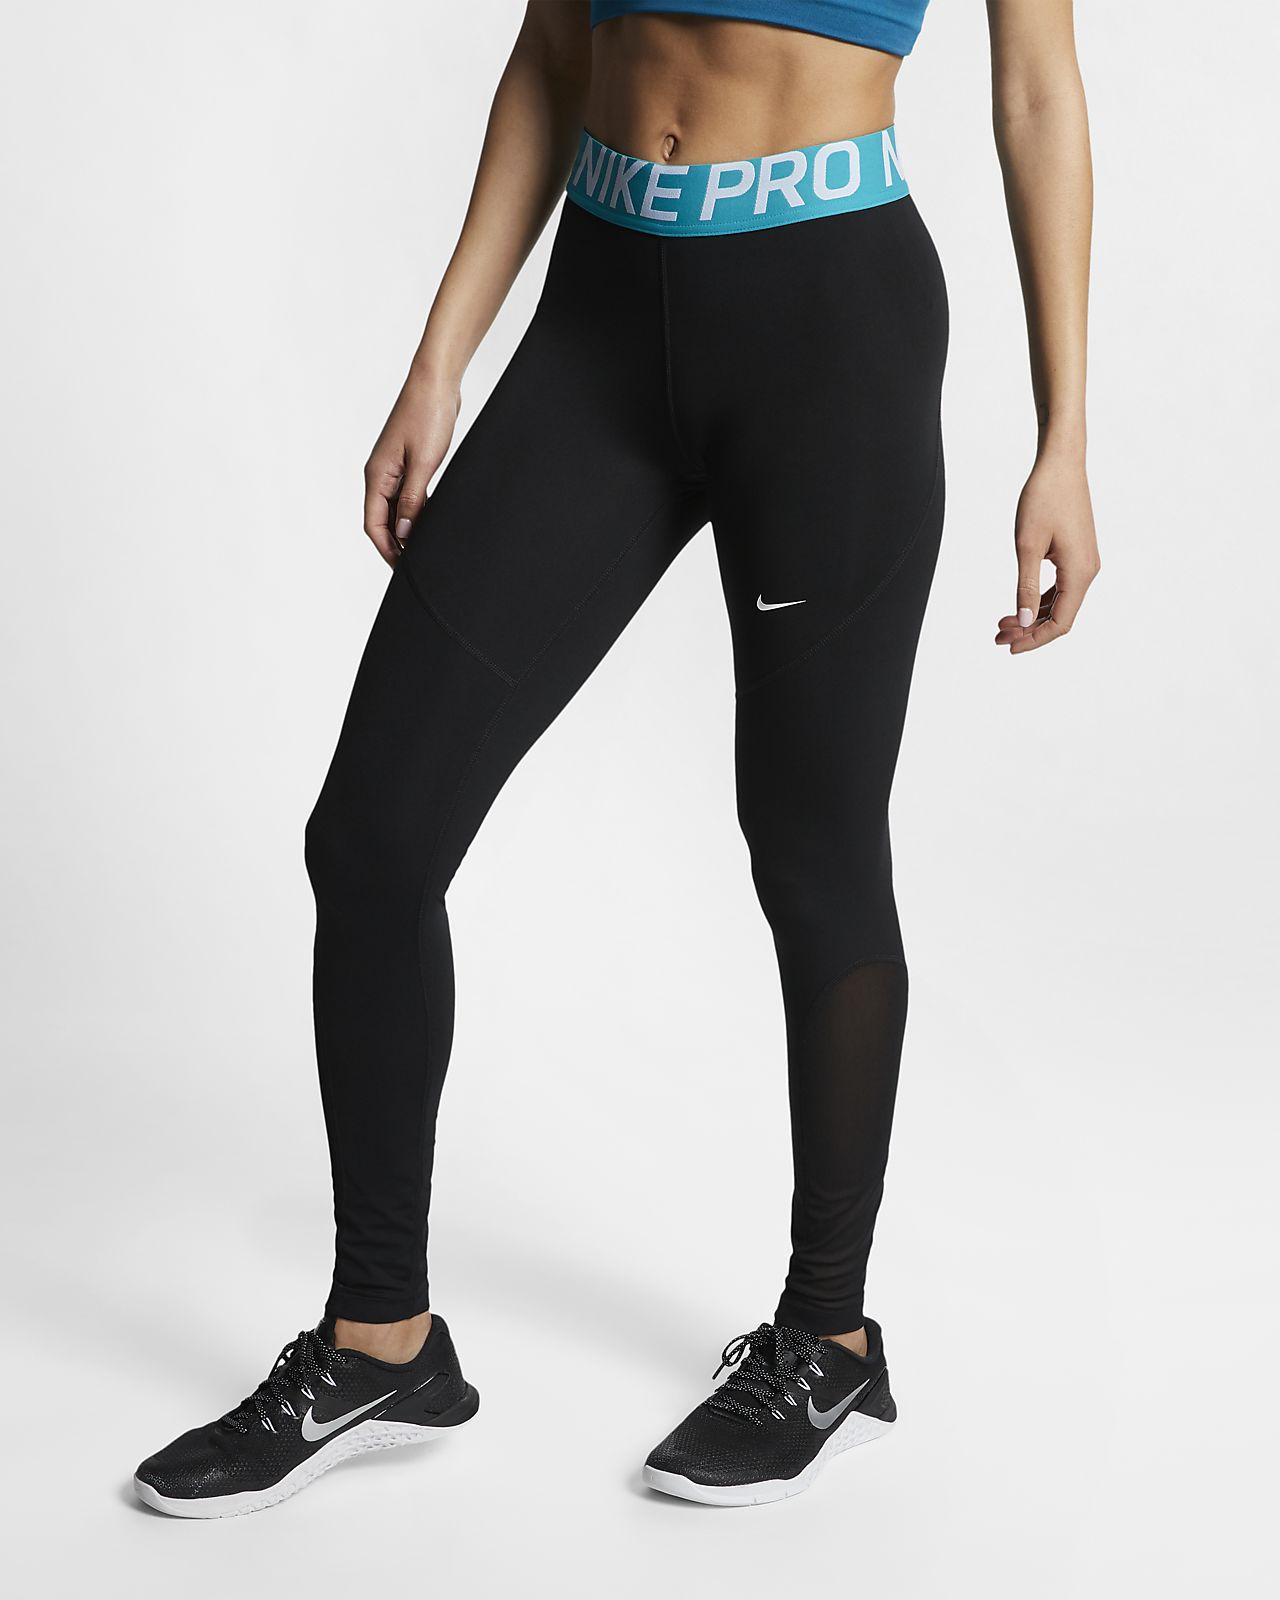 Nike Pro Damen-Tights